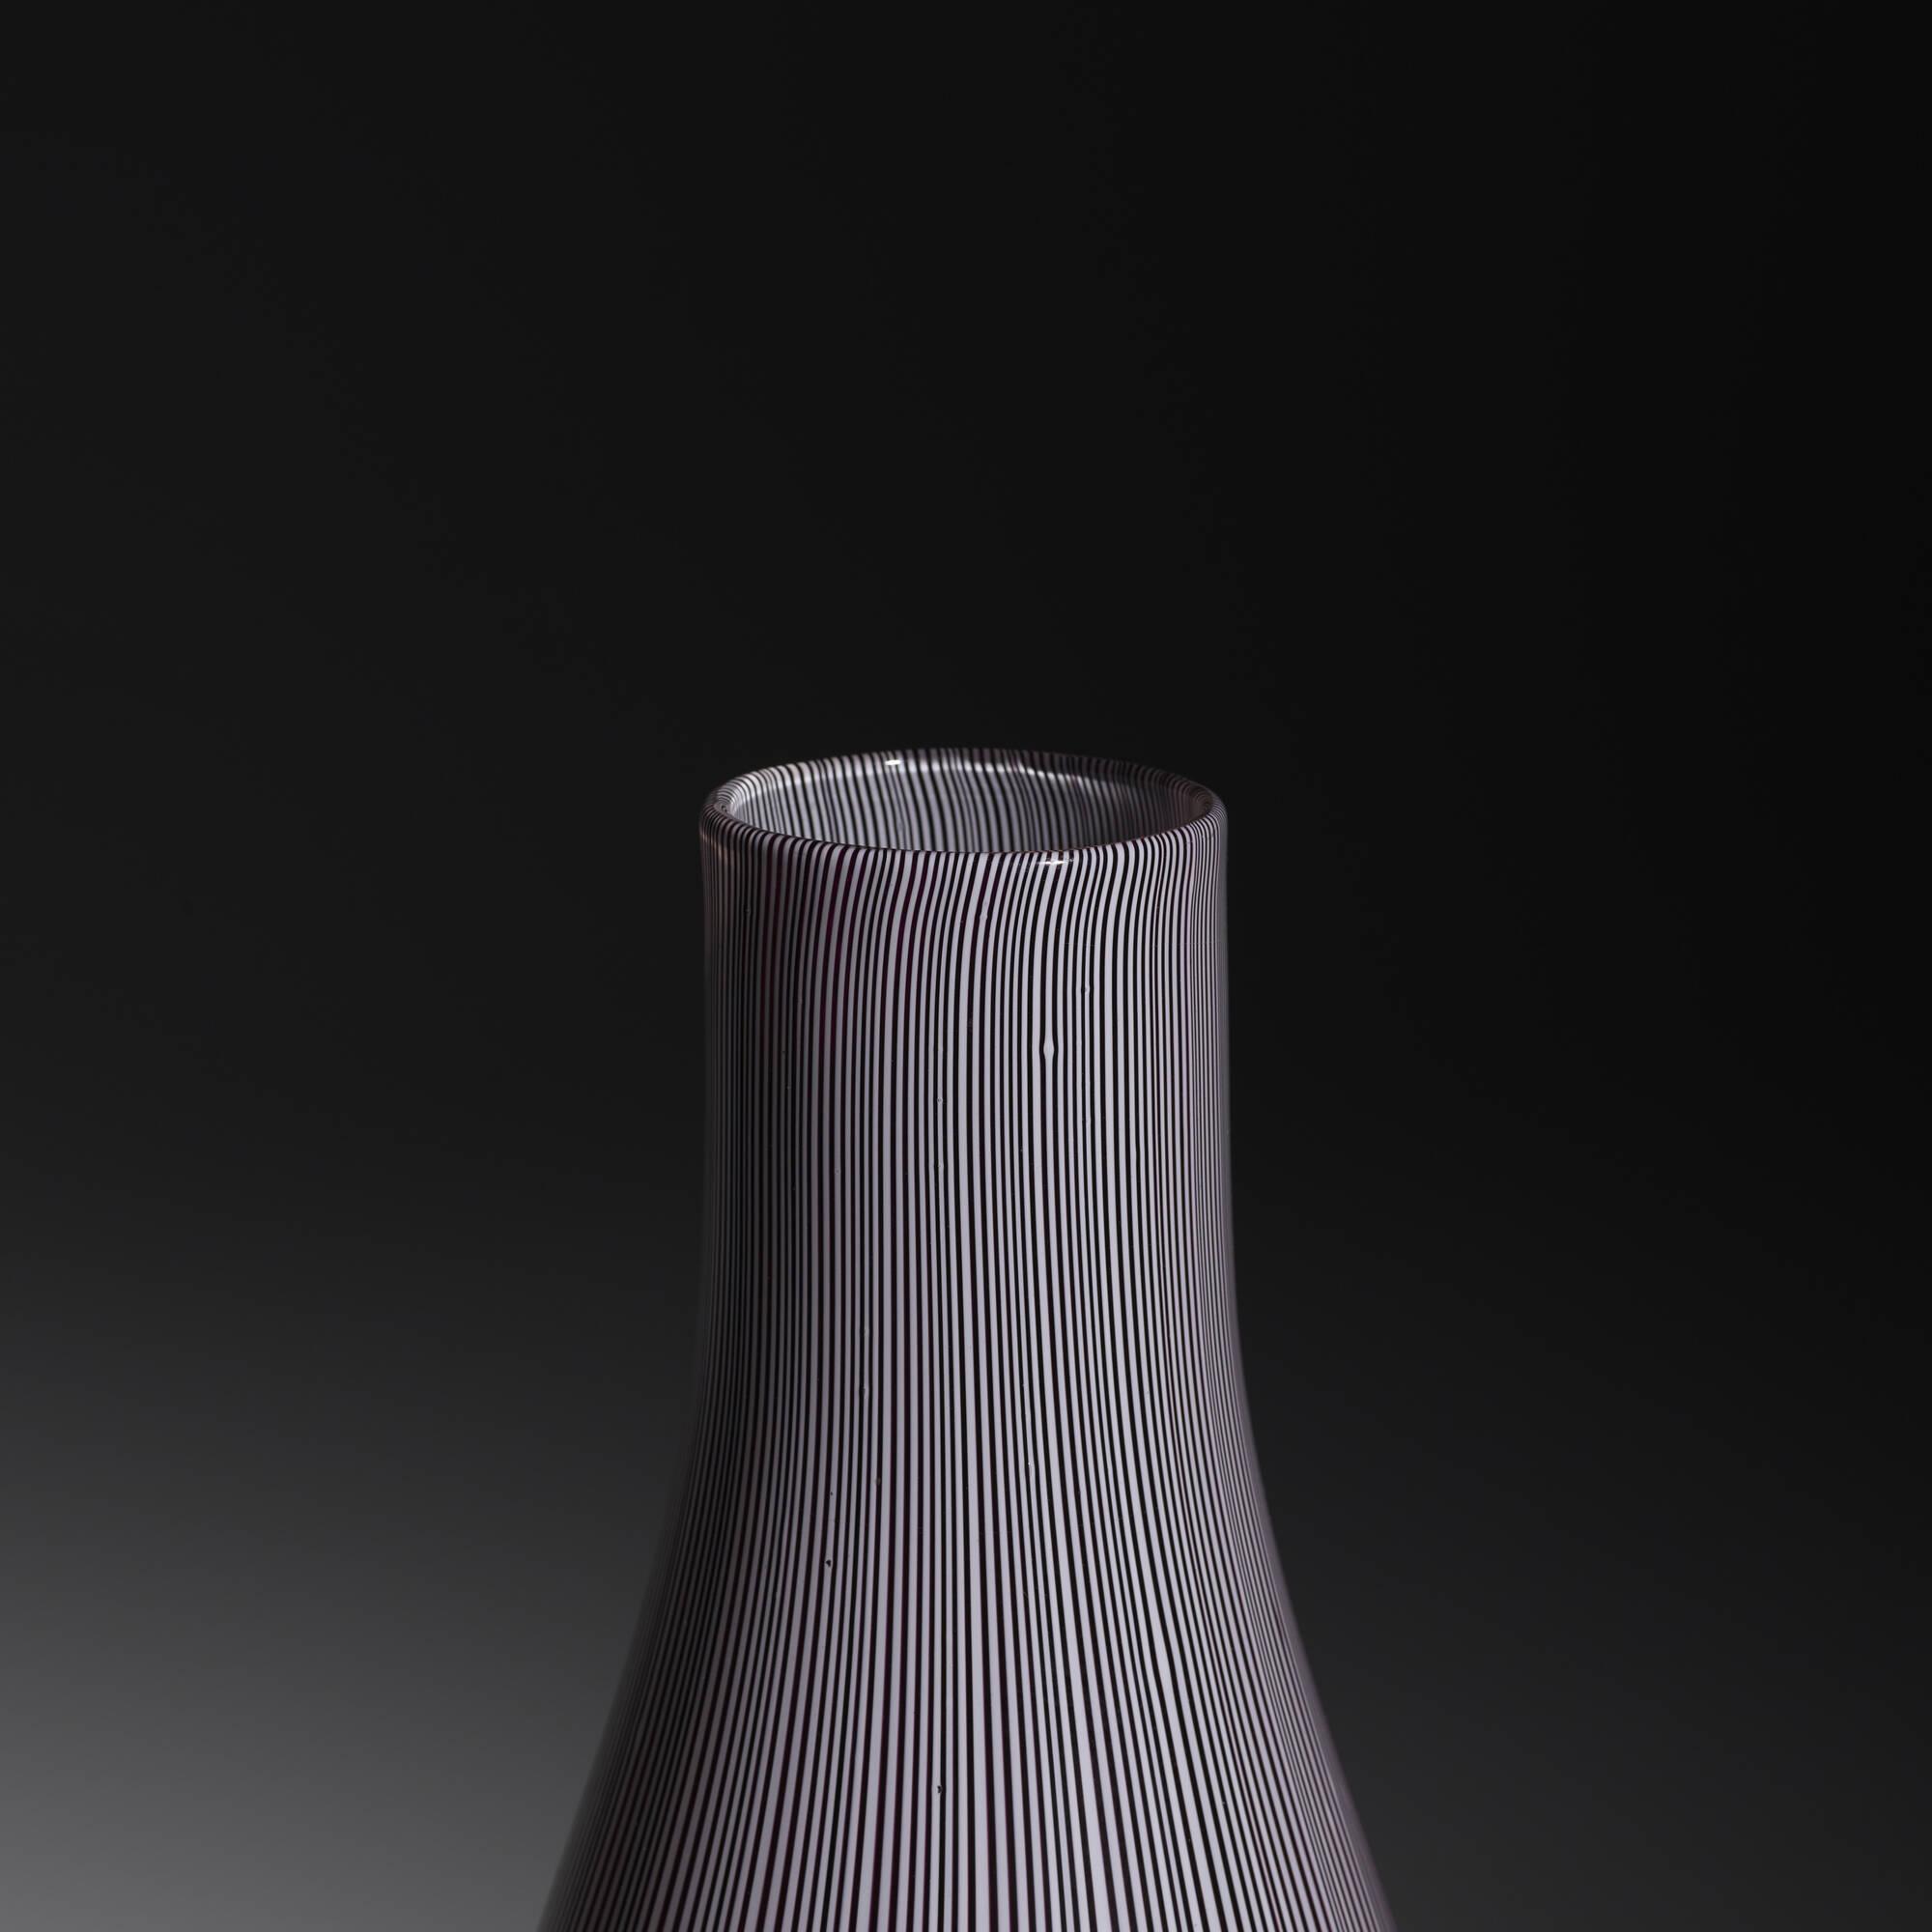 131: Carlo Scarpa / Tessuto vase, 3547 (2 of 4)